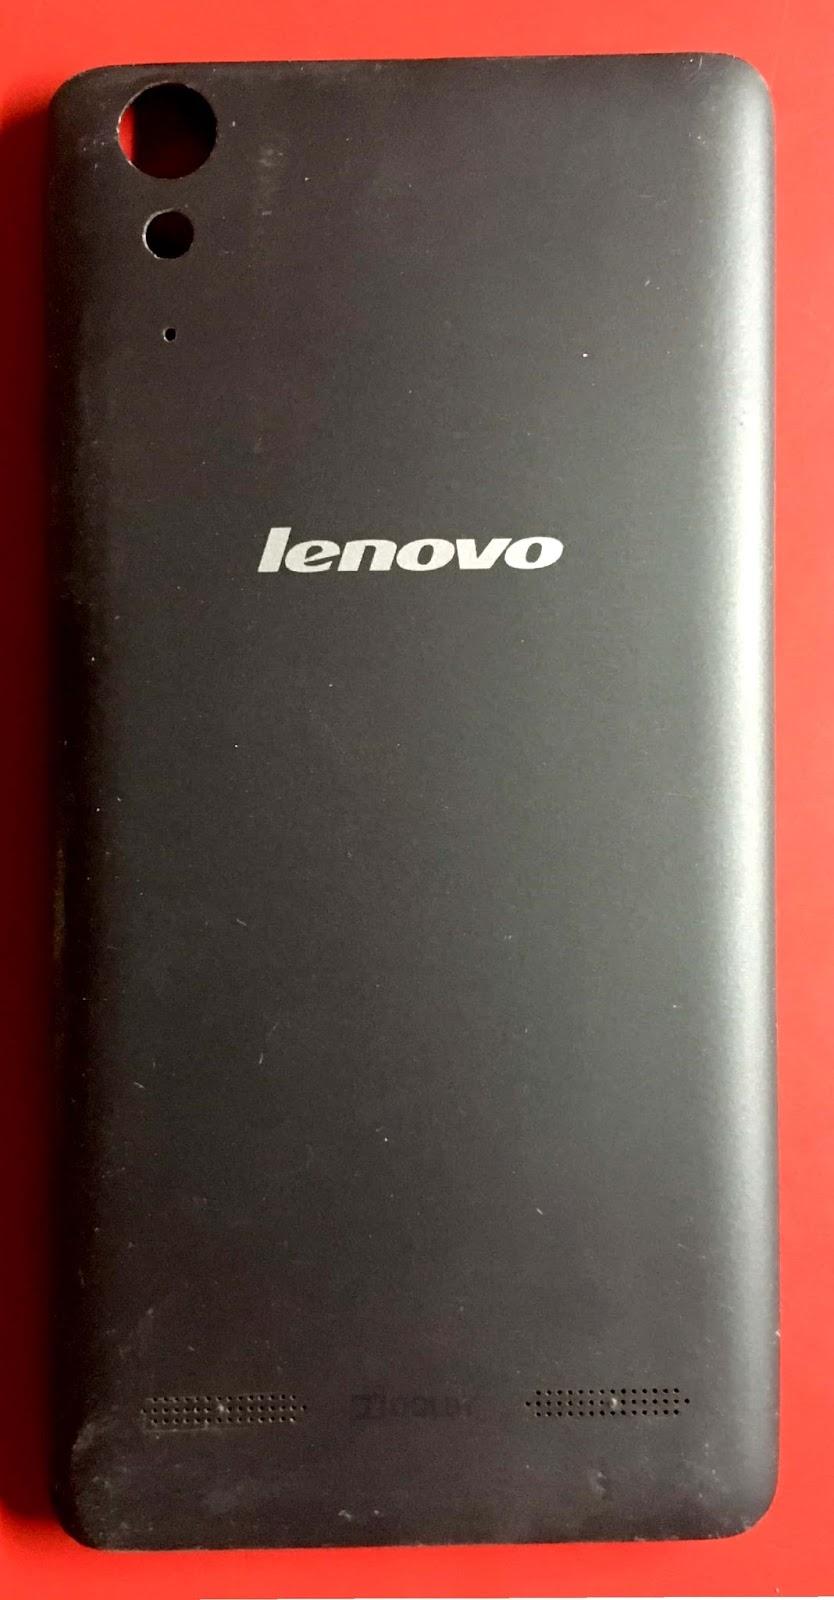 huge discount bfabd d41dc Lenovo A6000 Mobile Original all parts - spotindian +919909880202